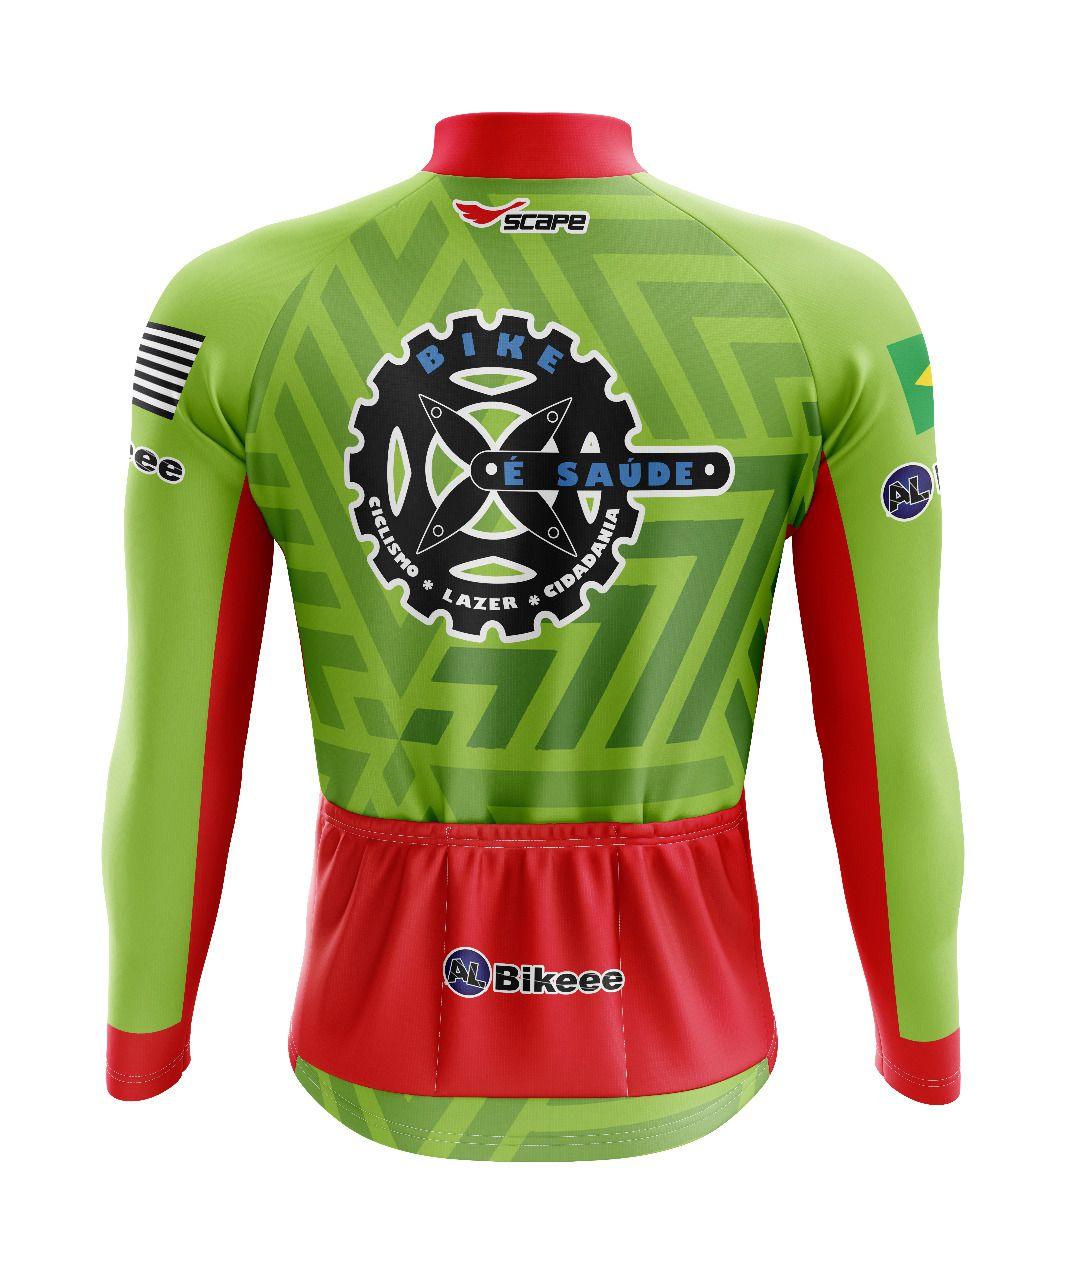 Camisa Personalizada Bike é saúde  Manga Longa